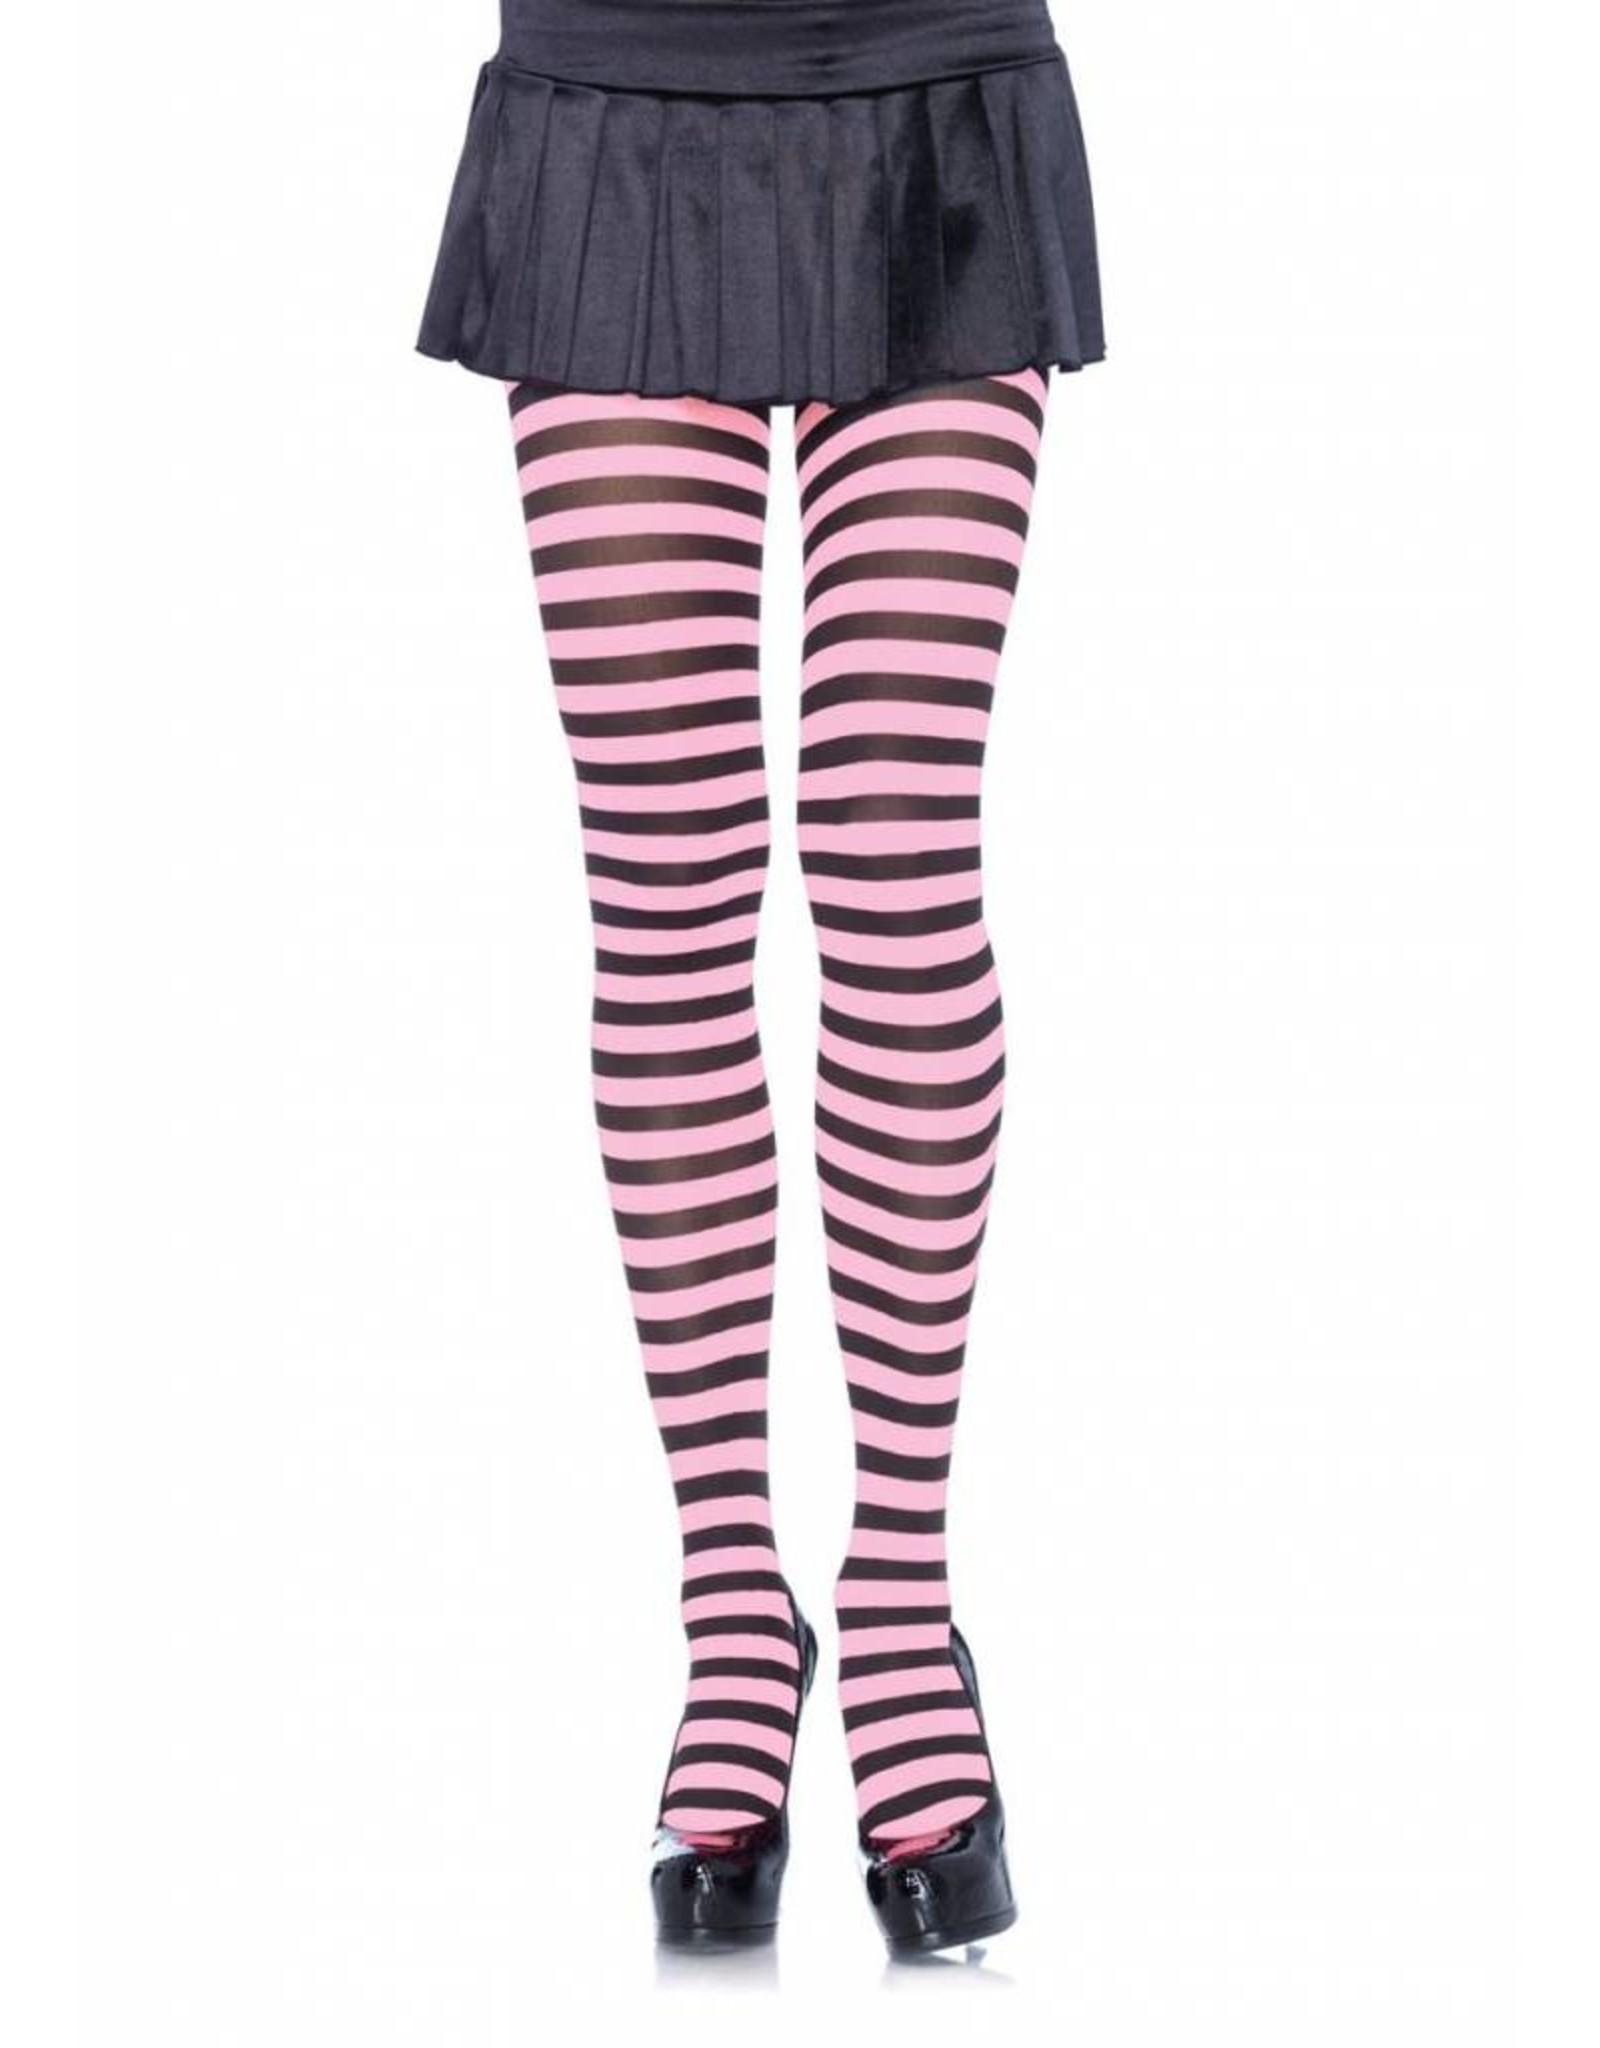 Leg Avenue Striped Tights Blk/Pink